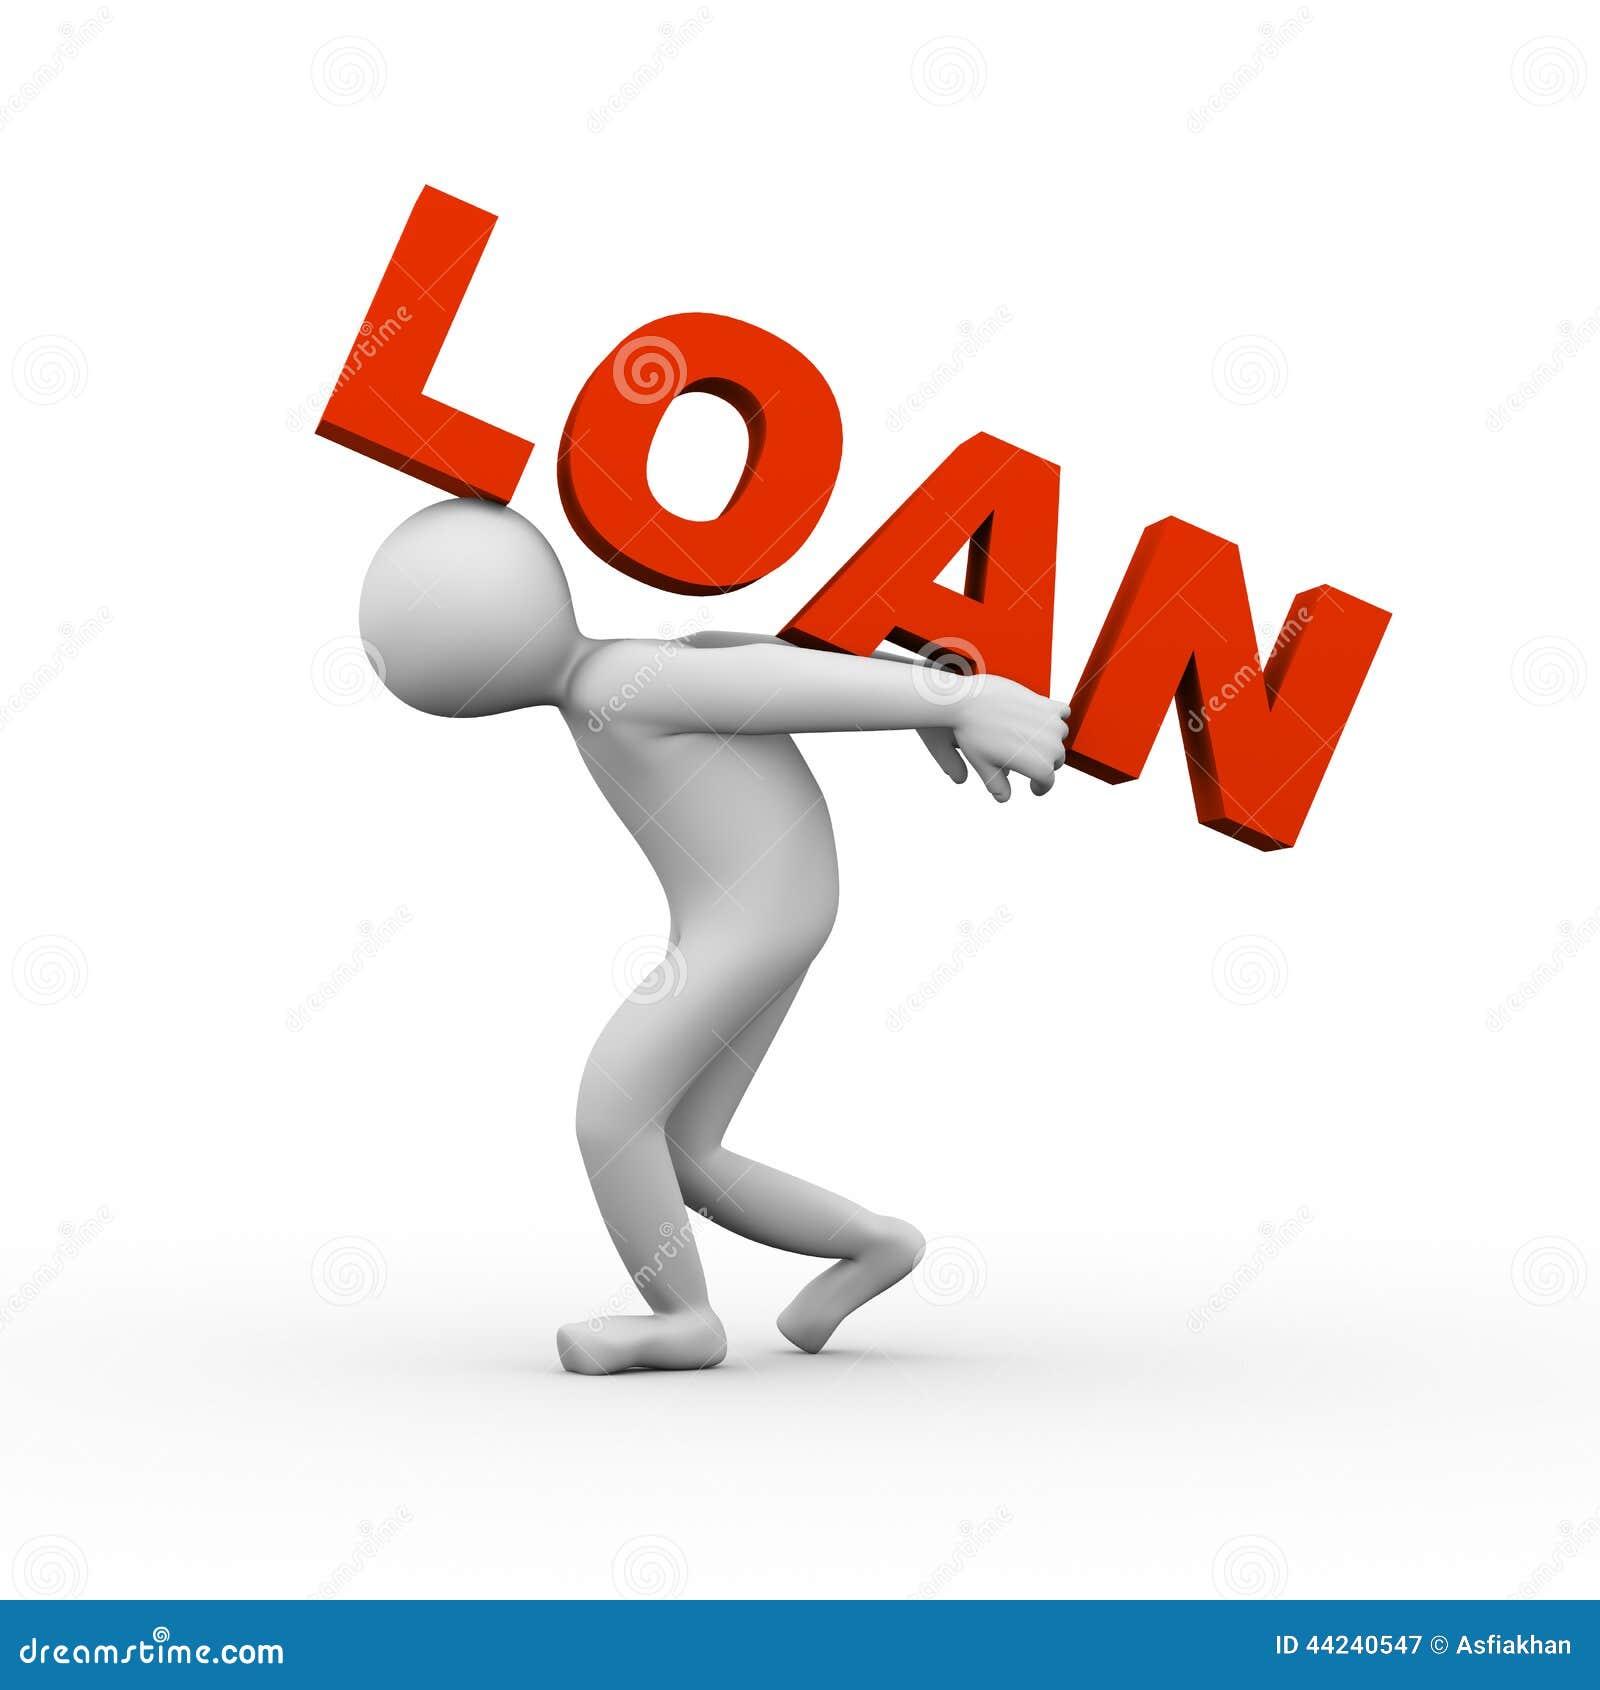 Mortgage Bankruptcy Loan